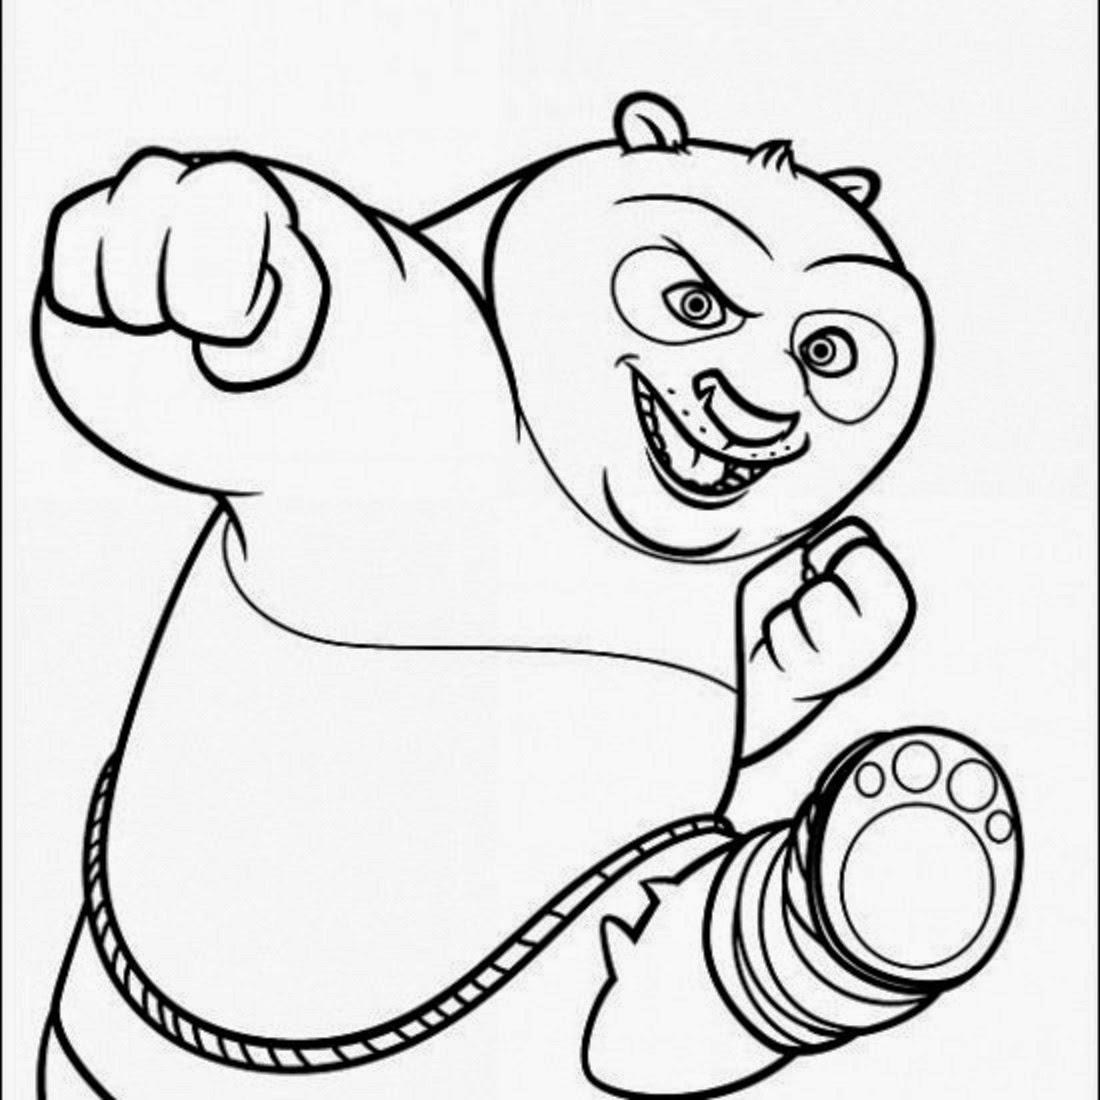 1100x1100 Colours Drawing Wallpaper Kung Fu Panda Colour Drawing Hd Wallpaper